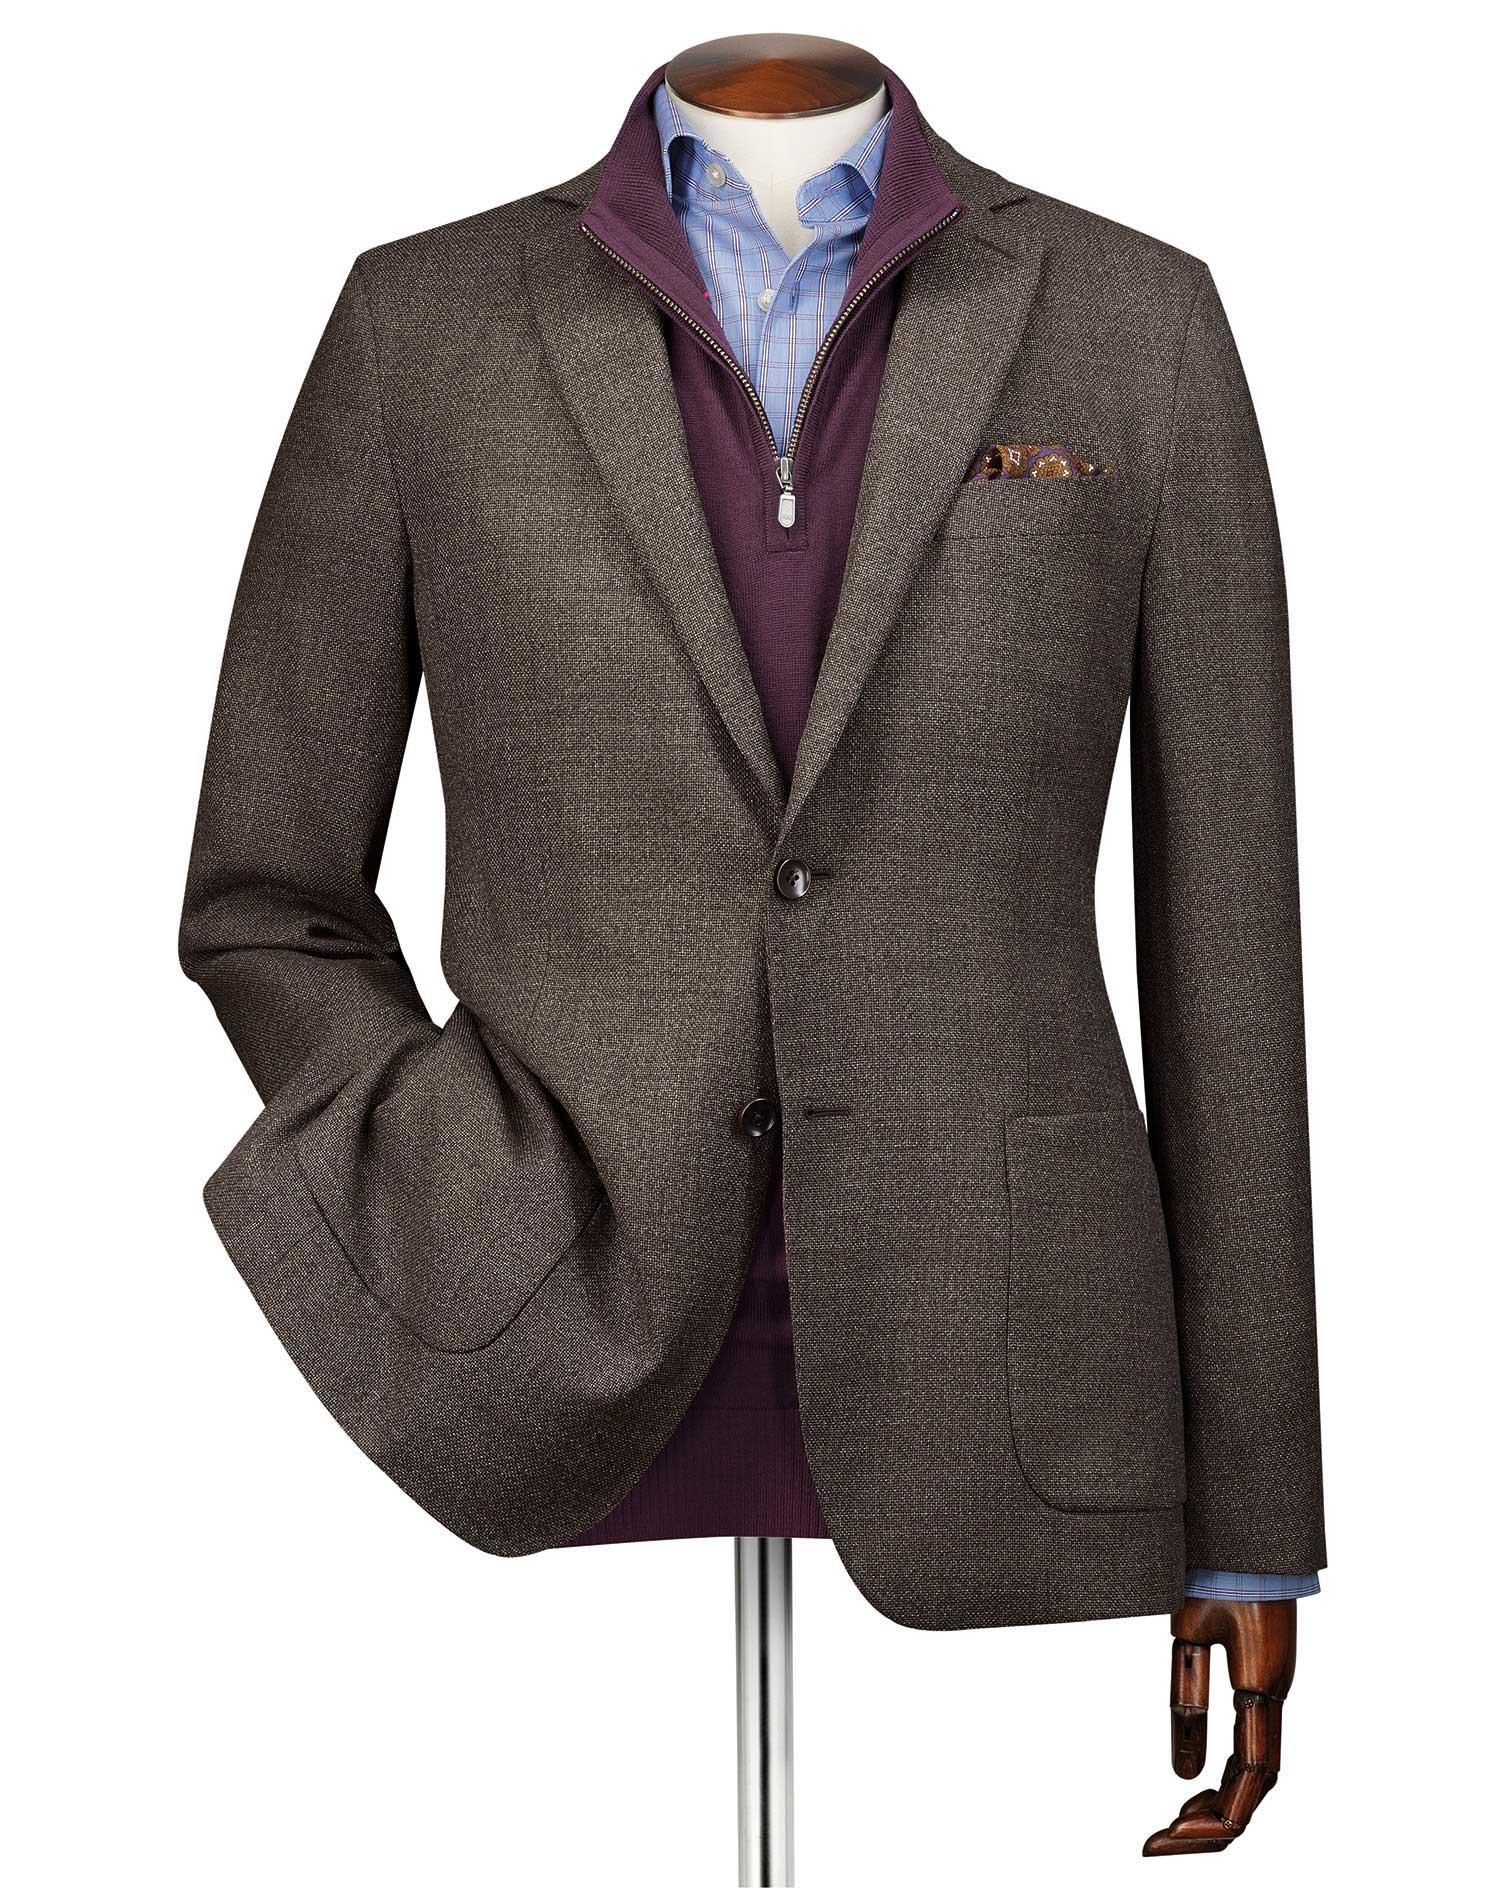 Slim Fit Mocha Italian Wool Blazer Size 44 Regular by Charles Tyrwhitt